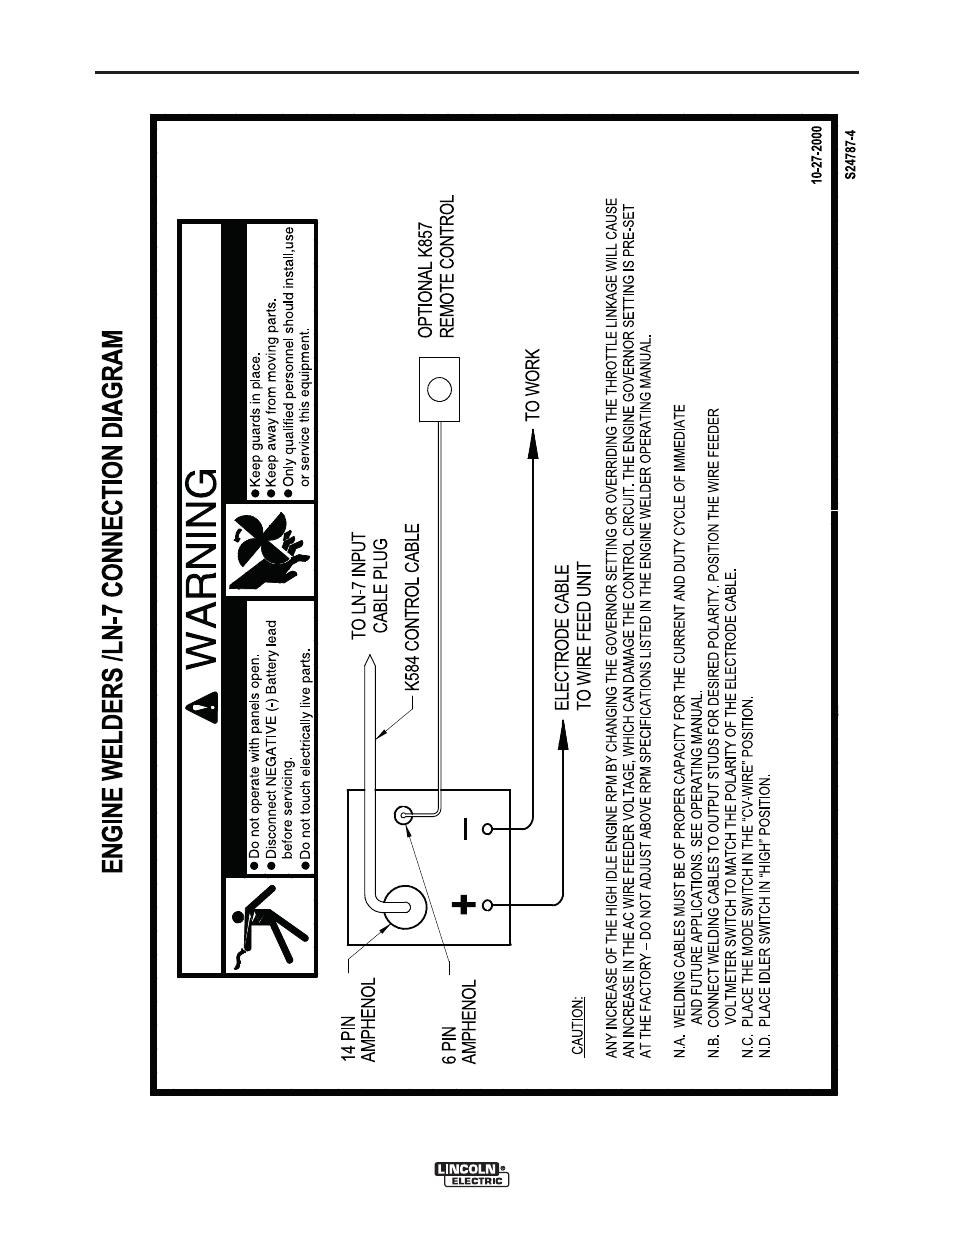 Lincoln Cv400 Wiring Diagram Box Databse 1997 Continental Throttle Dc Jack